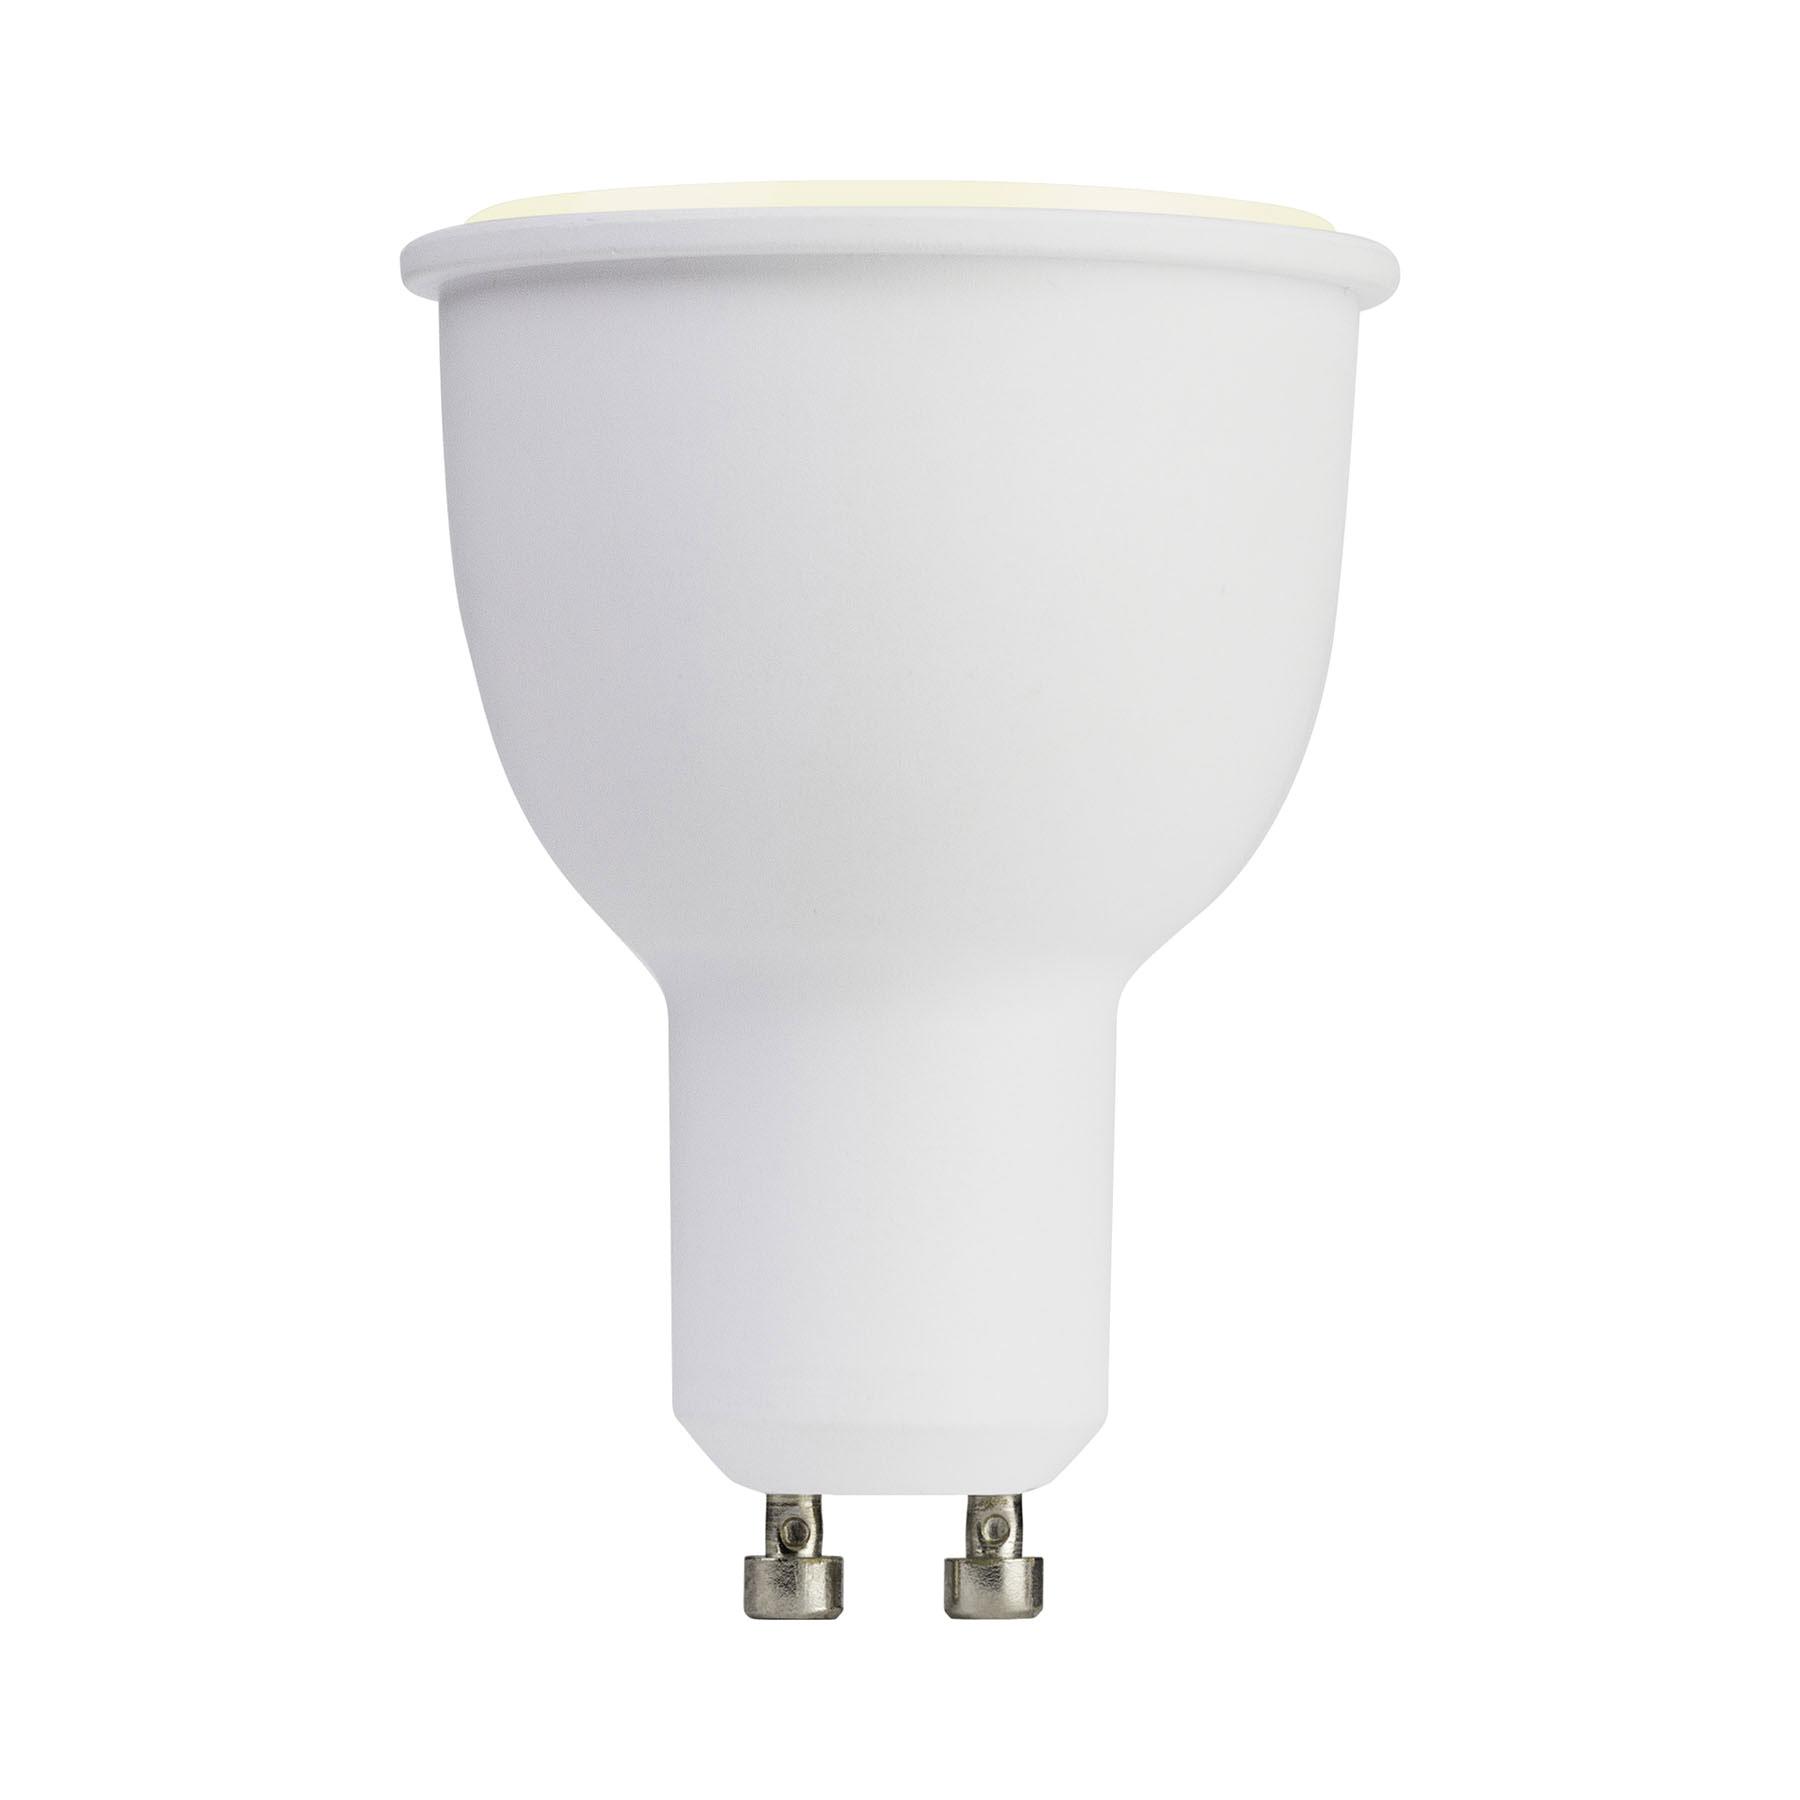 4.5watt Smart GU10 LED 2pin Twist Lock Colour Changing Wifi Bulb